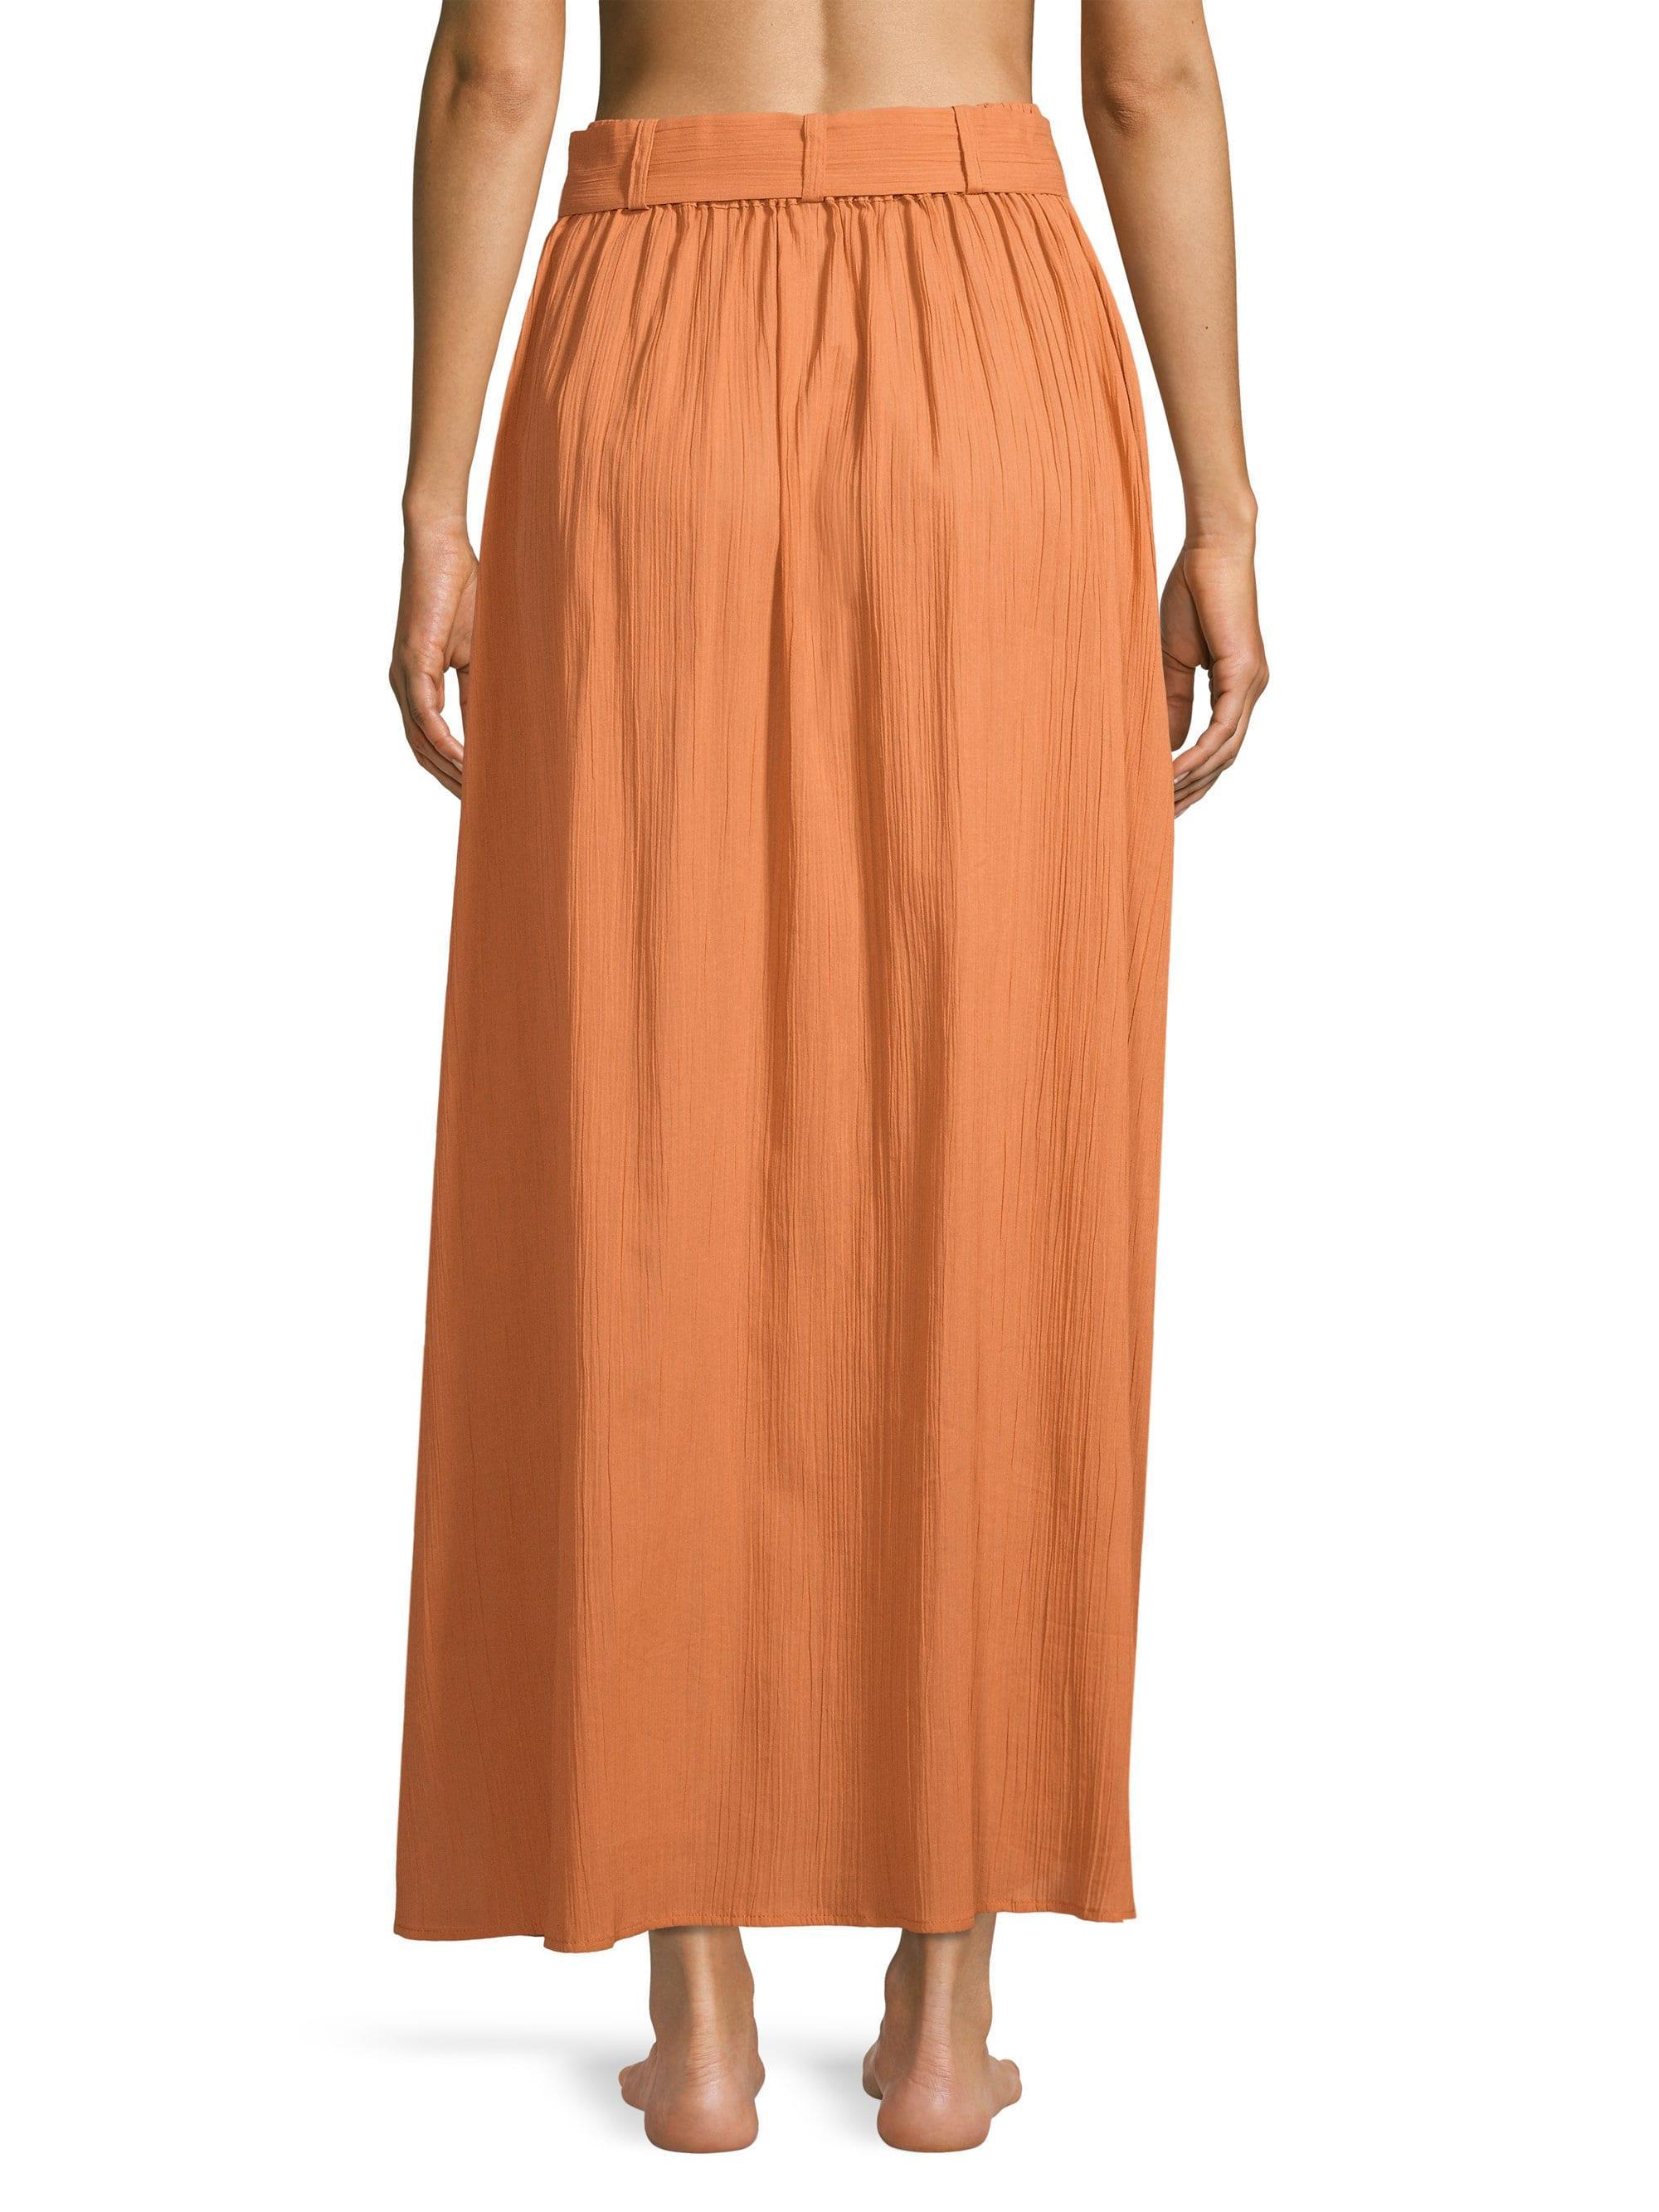 53523858d7 Lisa Marie Fernandez - Orange Belted Cotton-gauze Maxi Skirt - Lyst. View  fullscreen